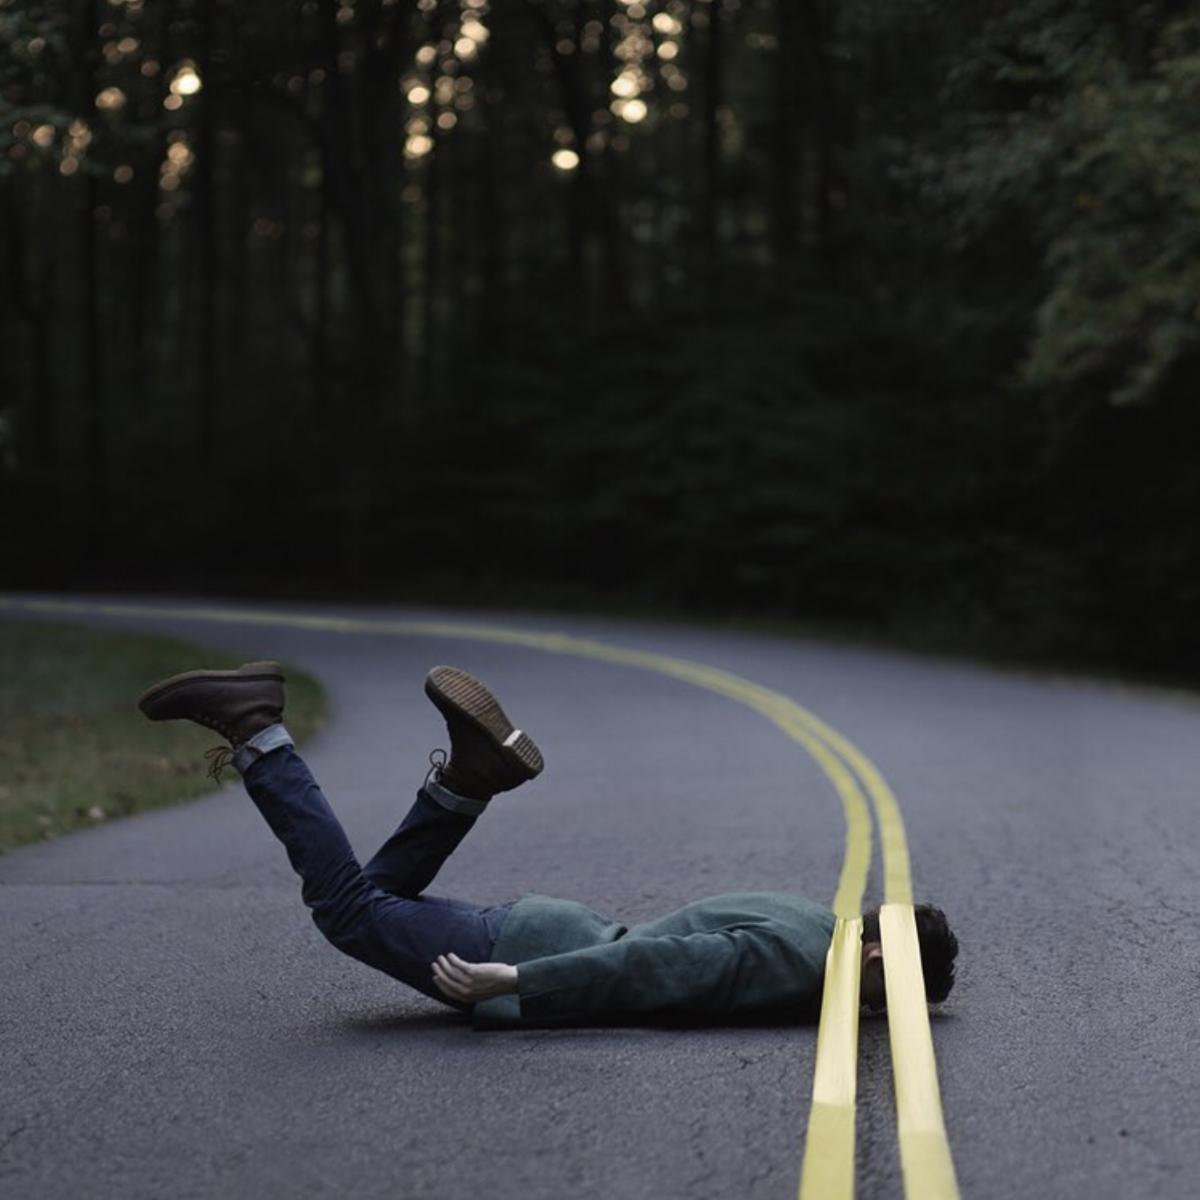 6-instagram-photographers-with-bizarre-content